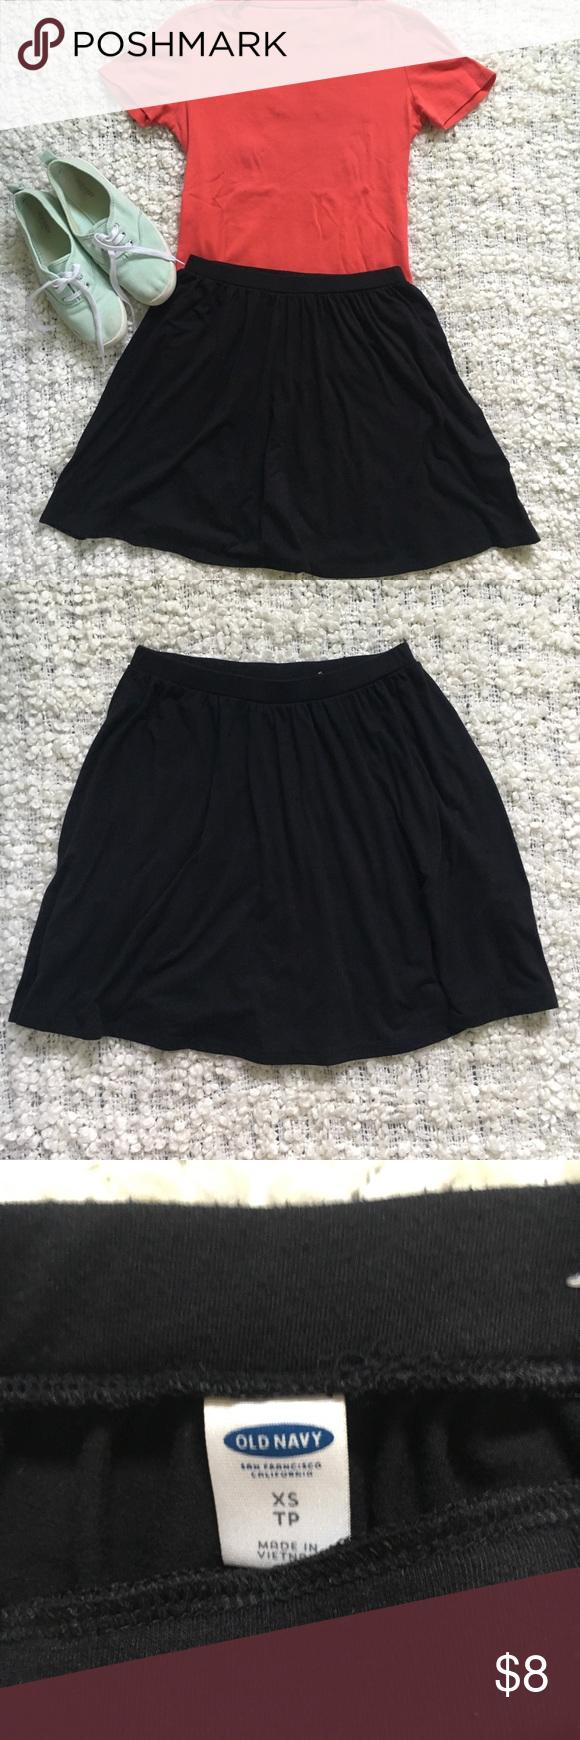 Old navy short black skirt navy shorts navy and rounding